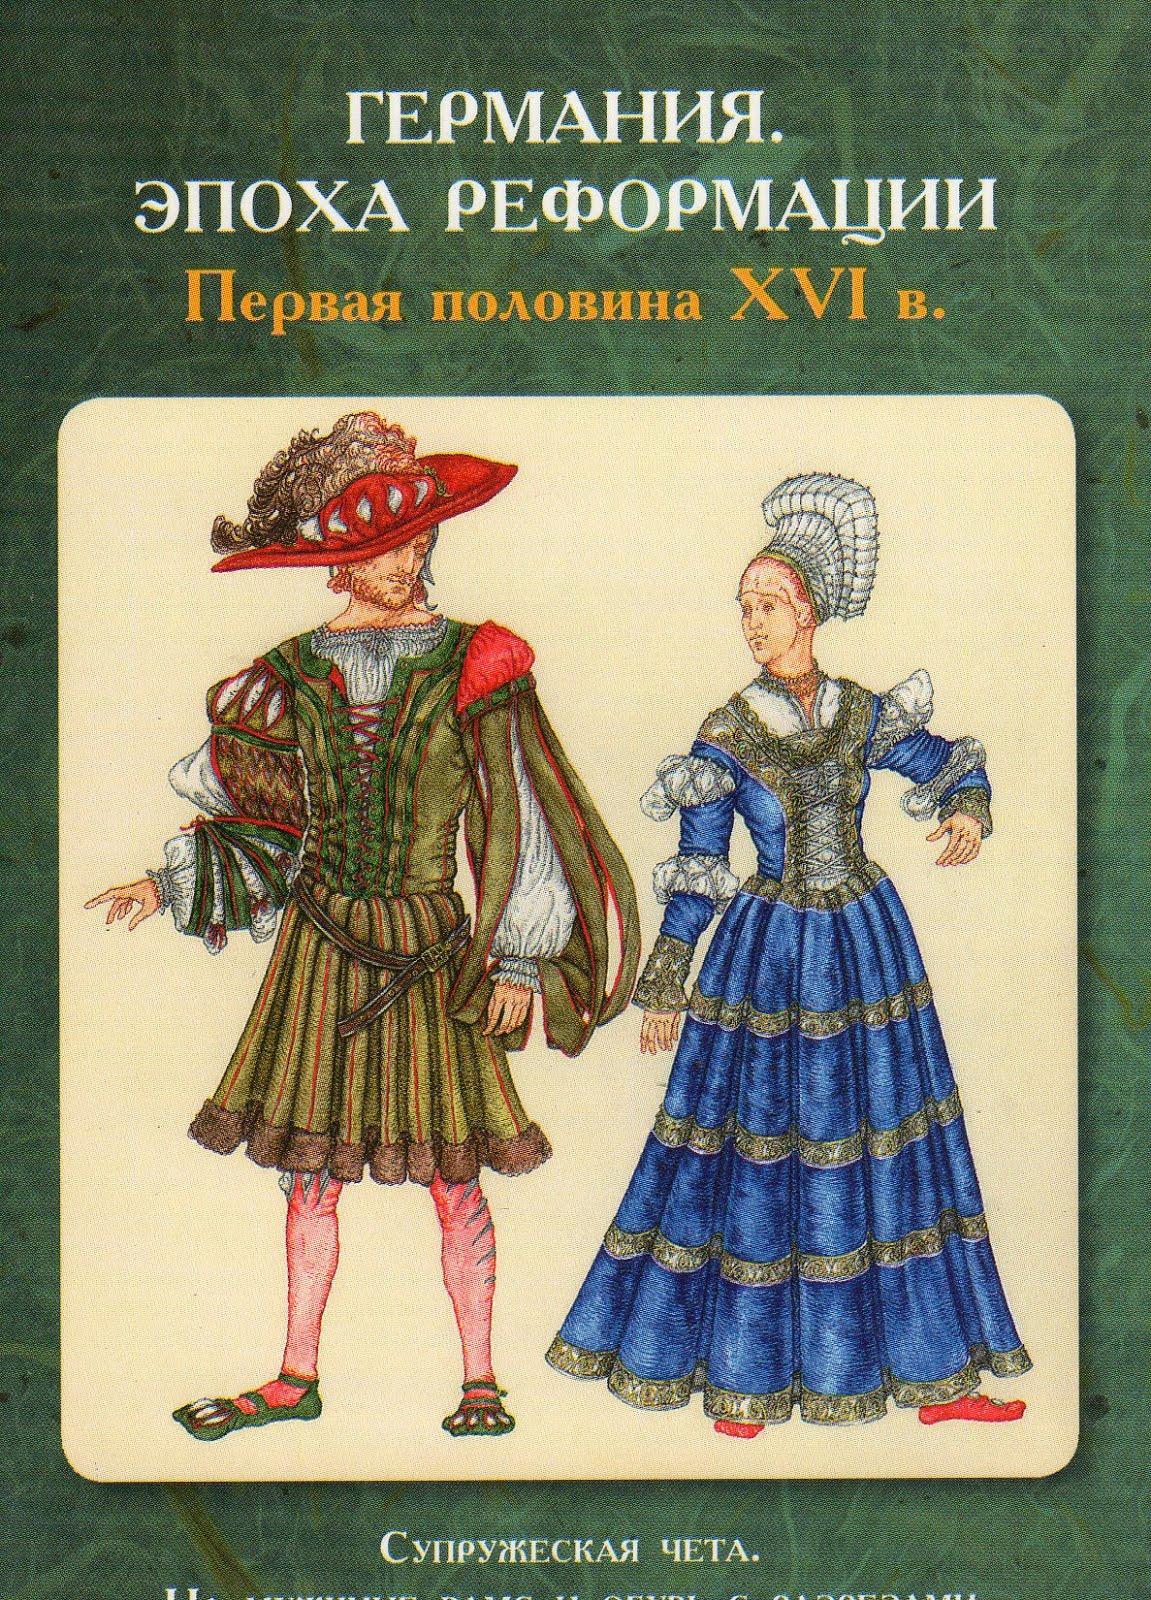 История костюма. Германия. Эпоха реформации. Первая половина XVI в.